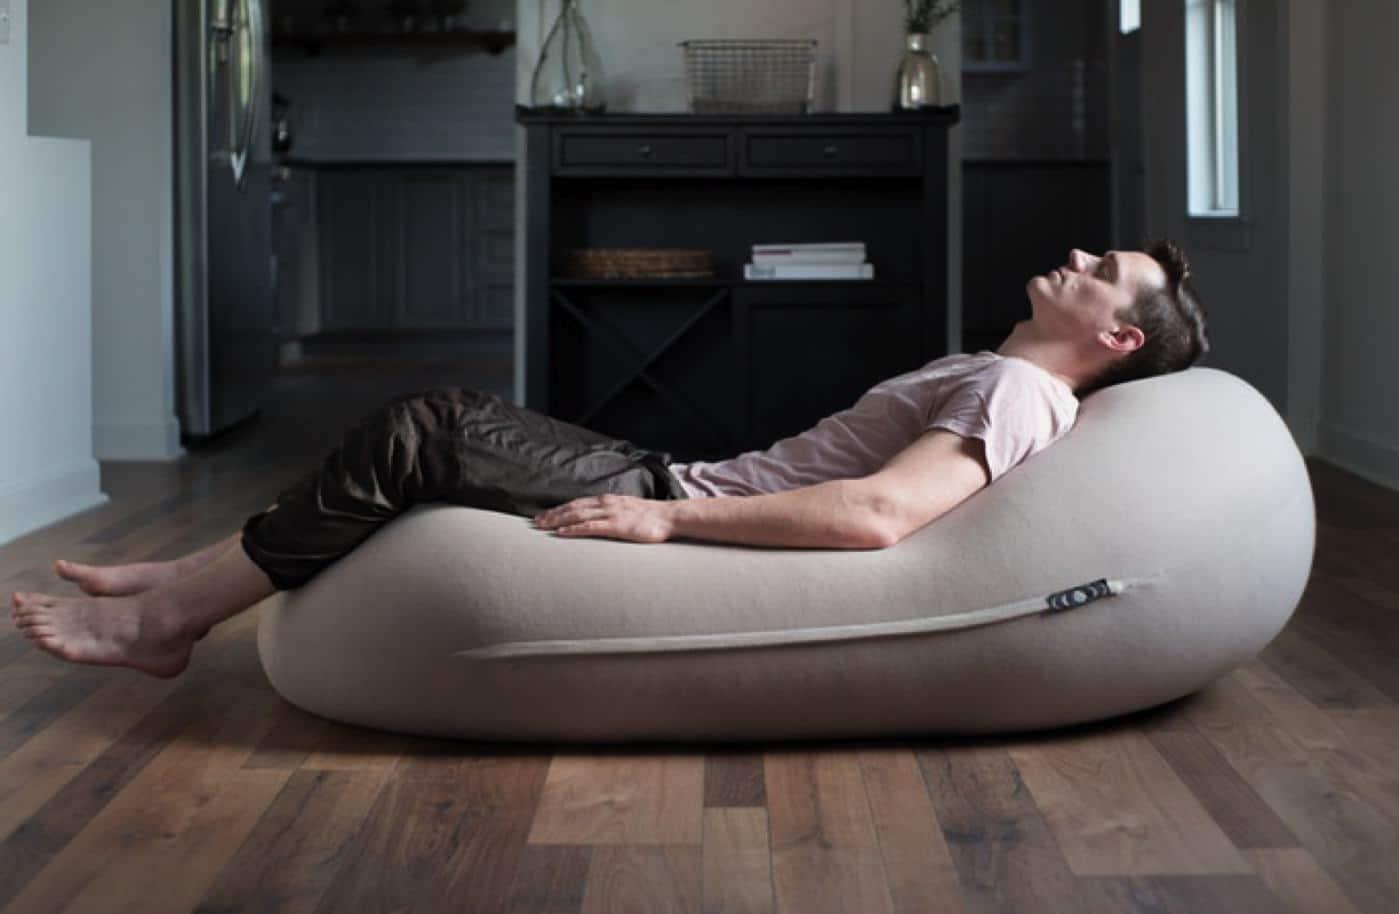 Awe Inspiring Review Moon Pod The Anti Stress Bean Bag Chair Knowtechie Machost Co Dining Chair Design Ideas Machostcouk